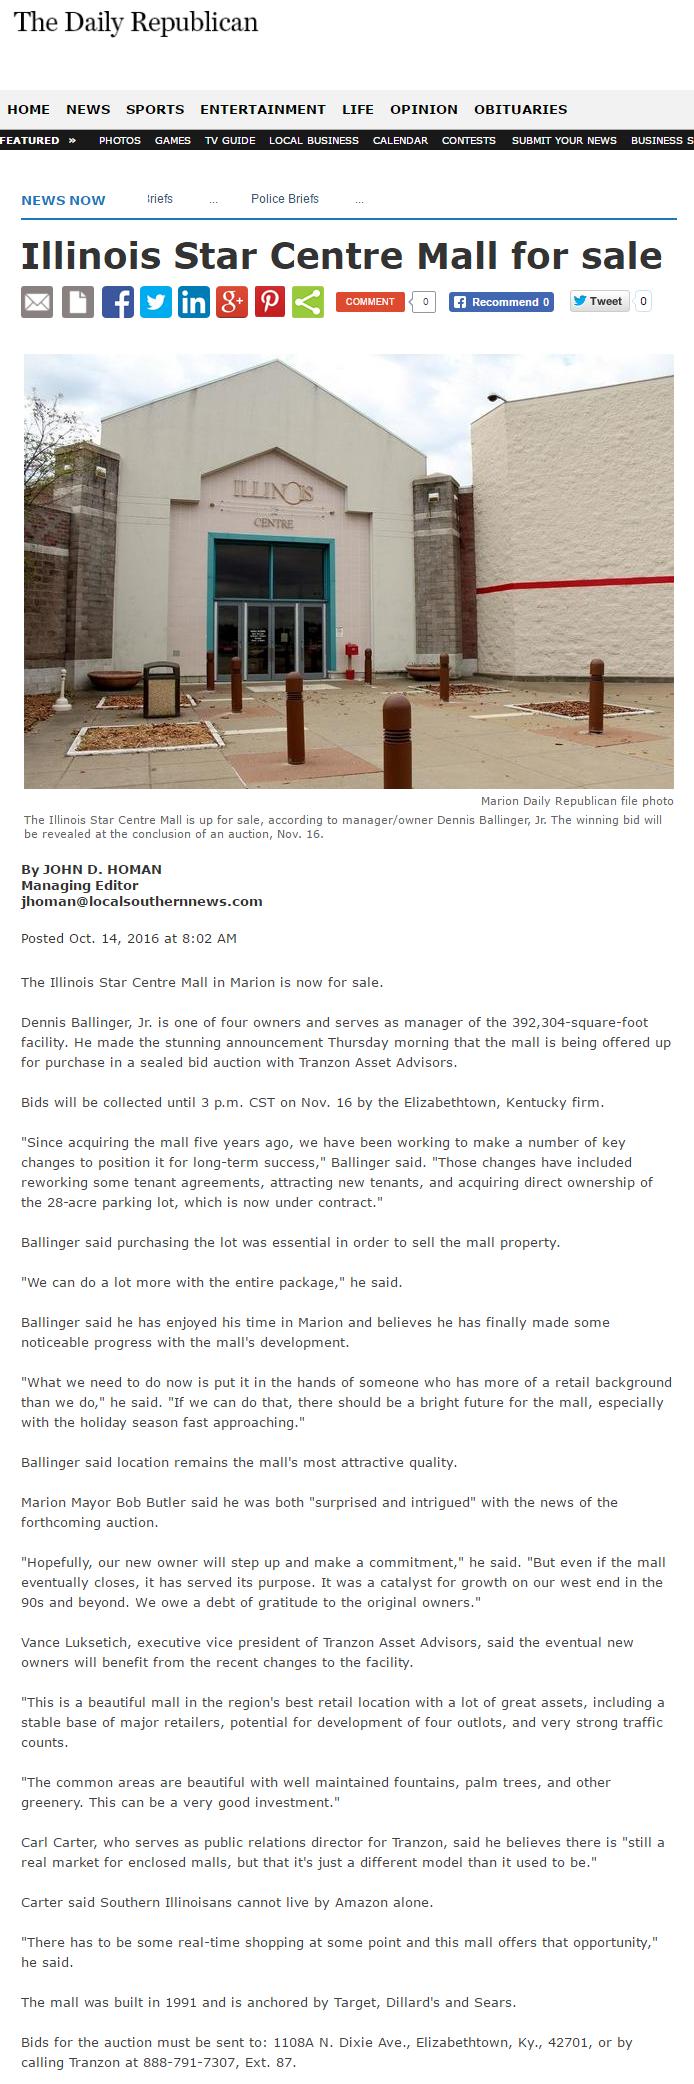 illinois-star-centre-mall-for-sale-news-the-daily-republican-marion-il-marion-il